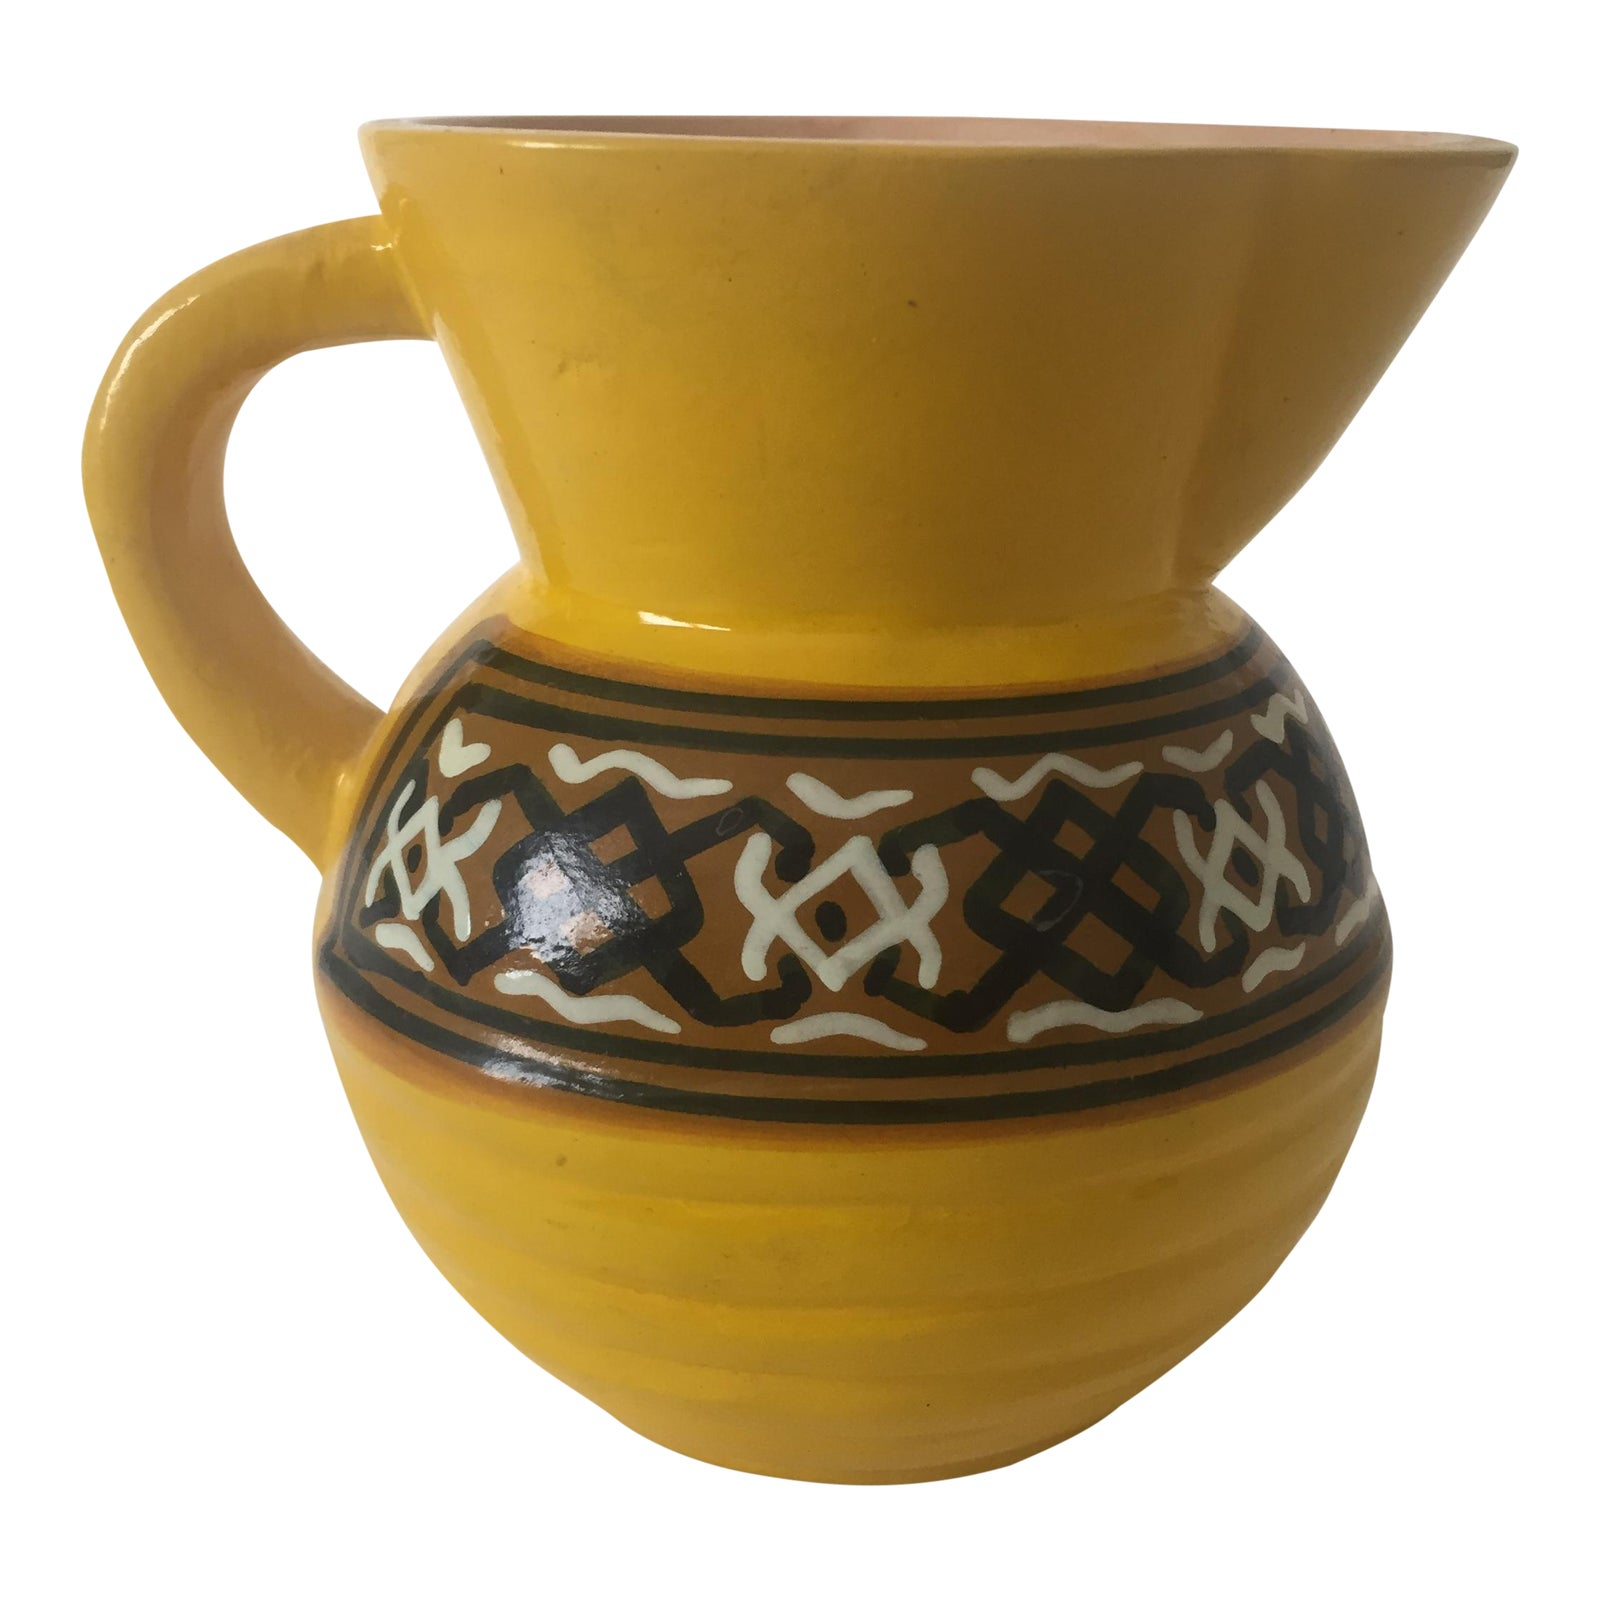 Vintage Kenya Pottery Yellow Pitcher Chairish